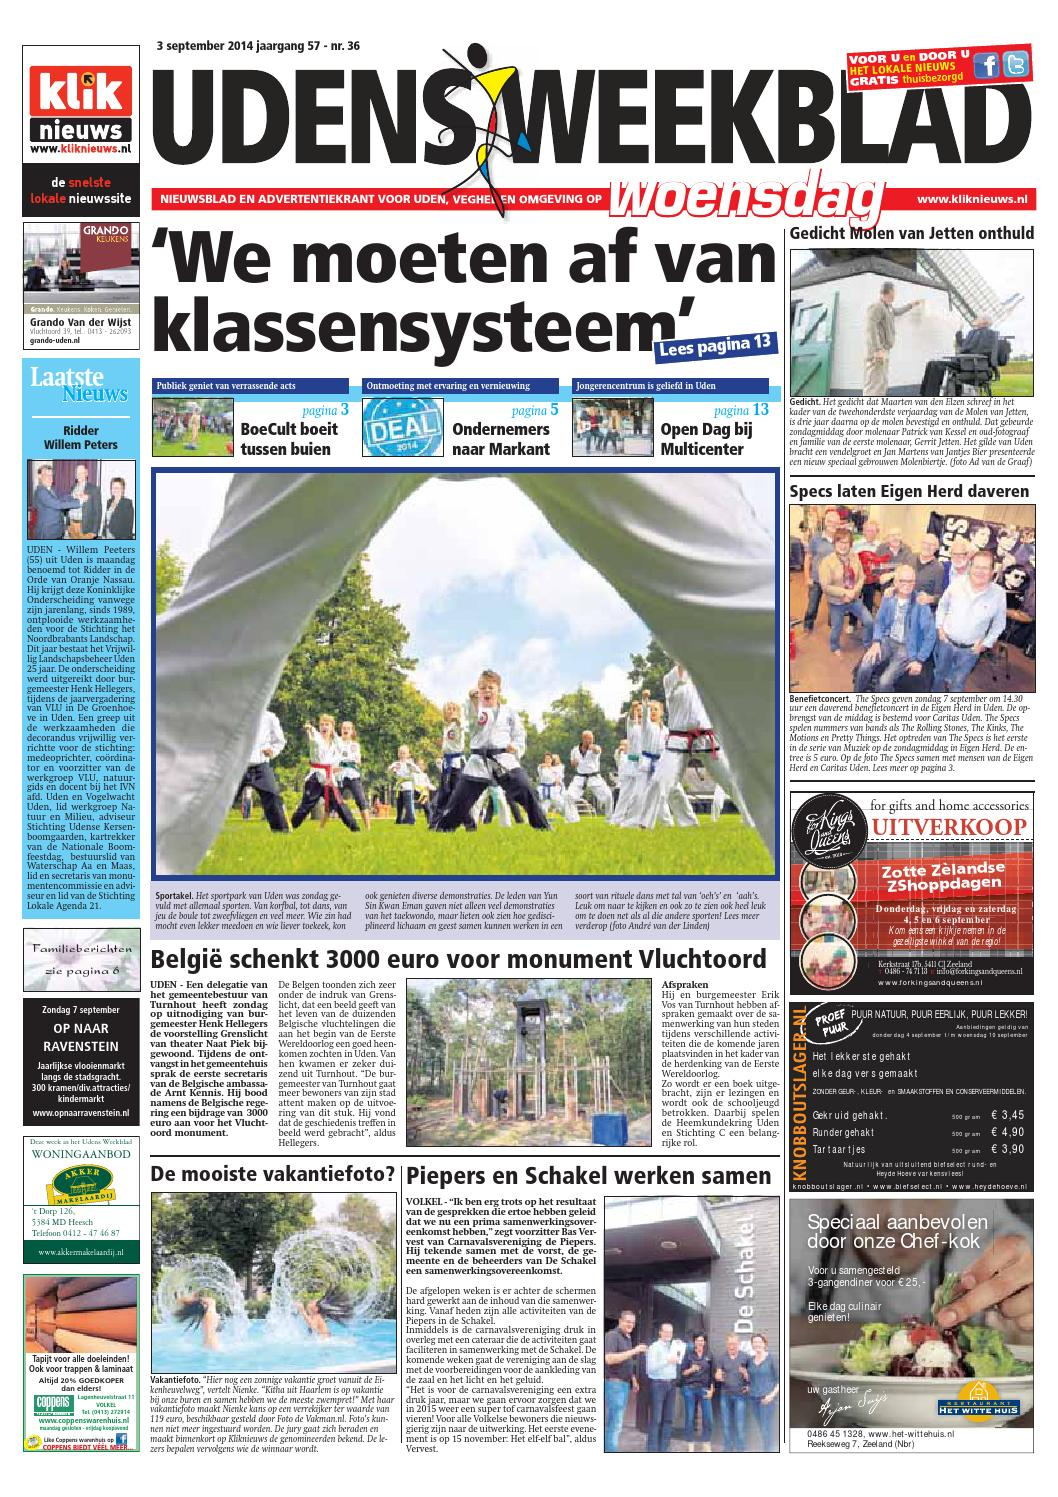 ISSUU - Udens Weekblad week 36 2014 by De Winter media groep: issuu.com/ideemagazine/docs/uwb_week_36_2014